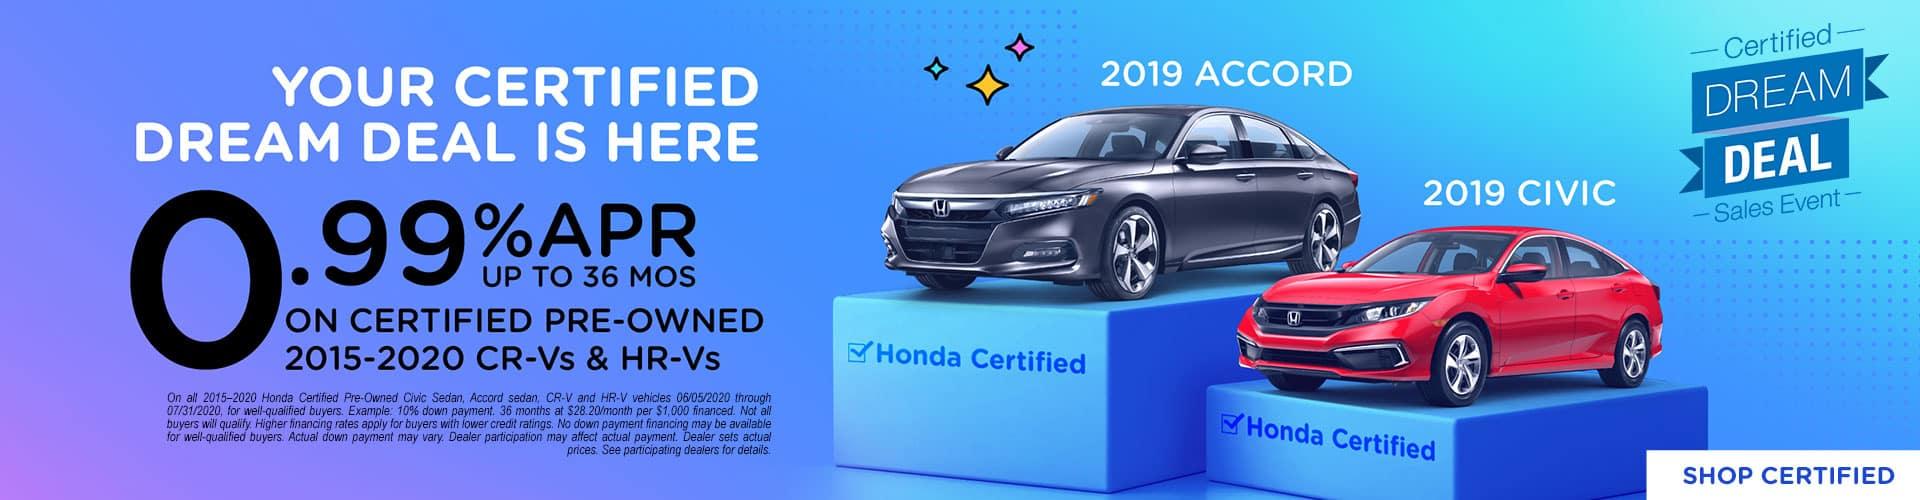 Shop Certified Now